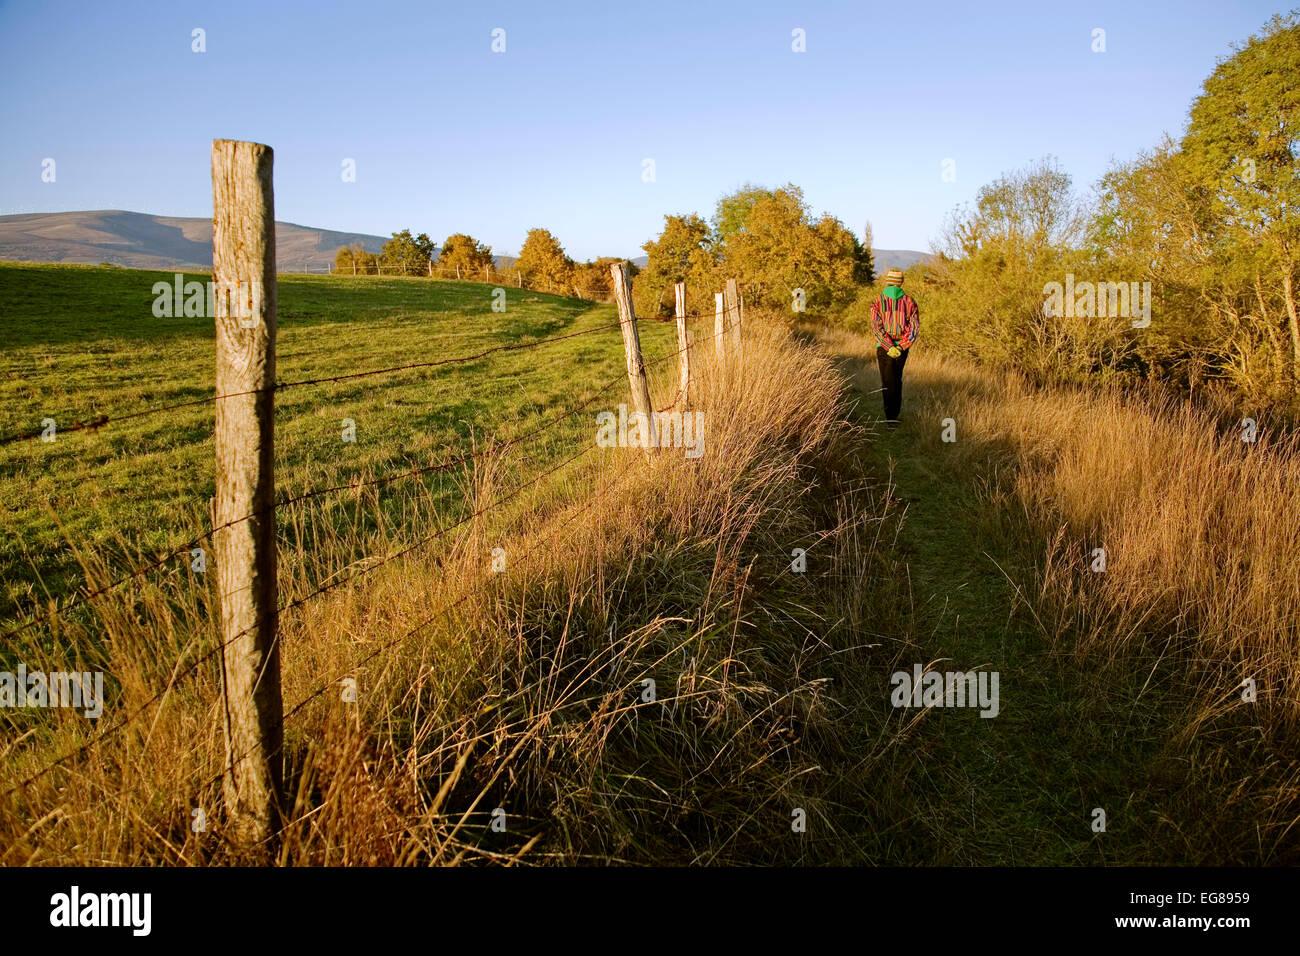 Woman walking on a trail in the field villasante montija burgos castilla leon Spain mujer caminando por un sendero - Stock Image